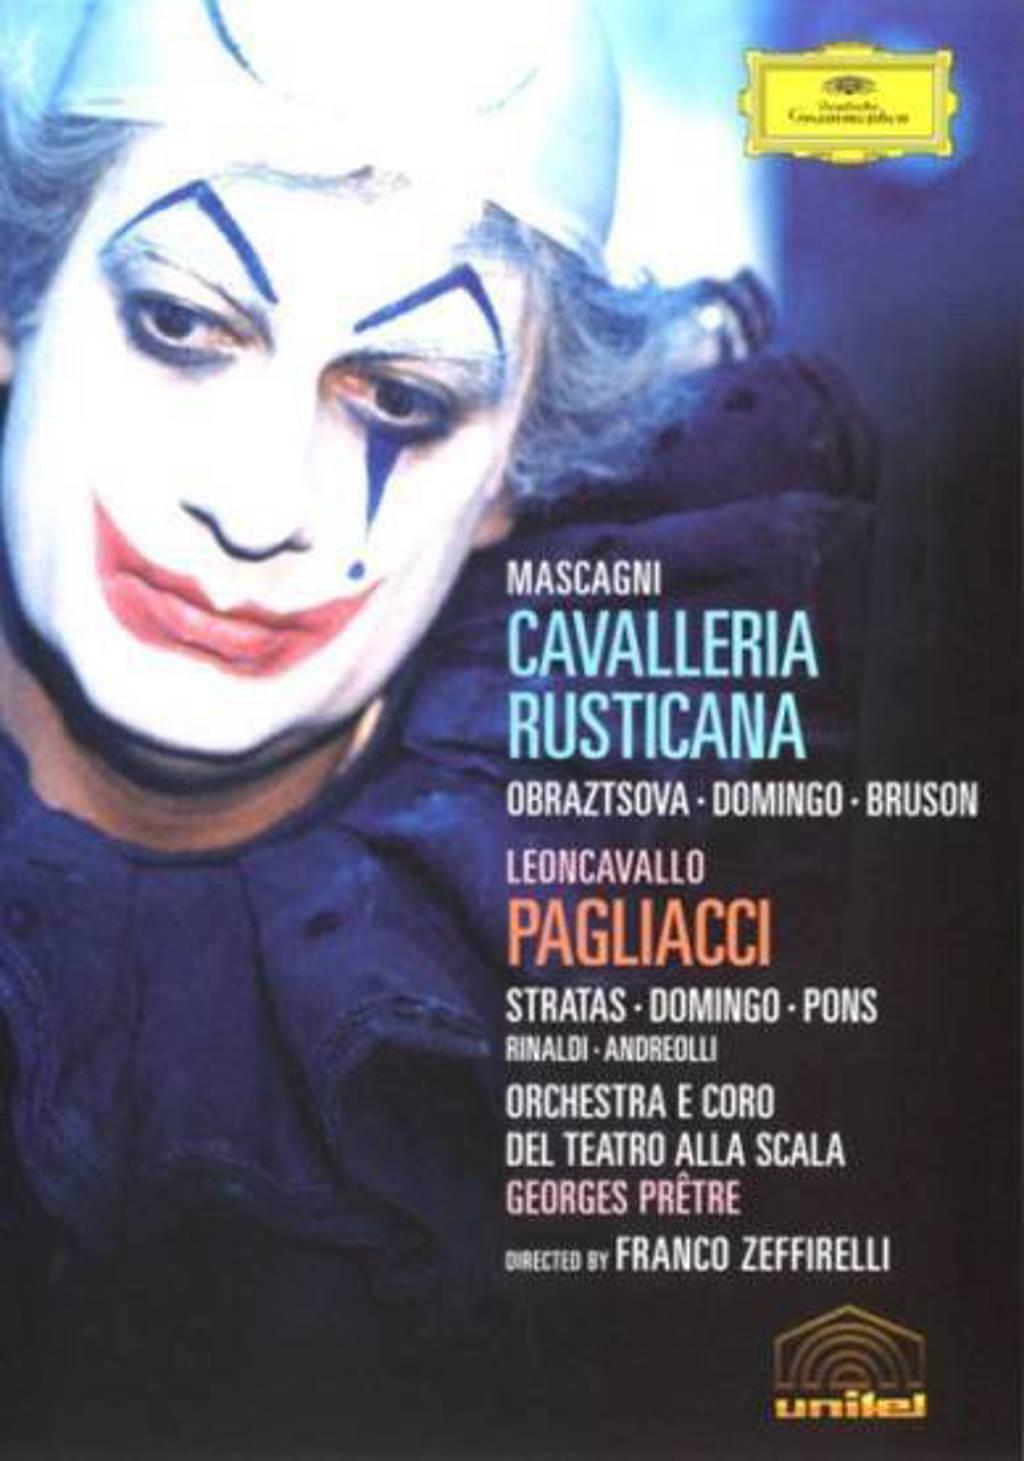 Cavalleria rusticana/Pagliacci (DVD)